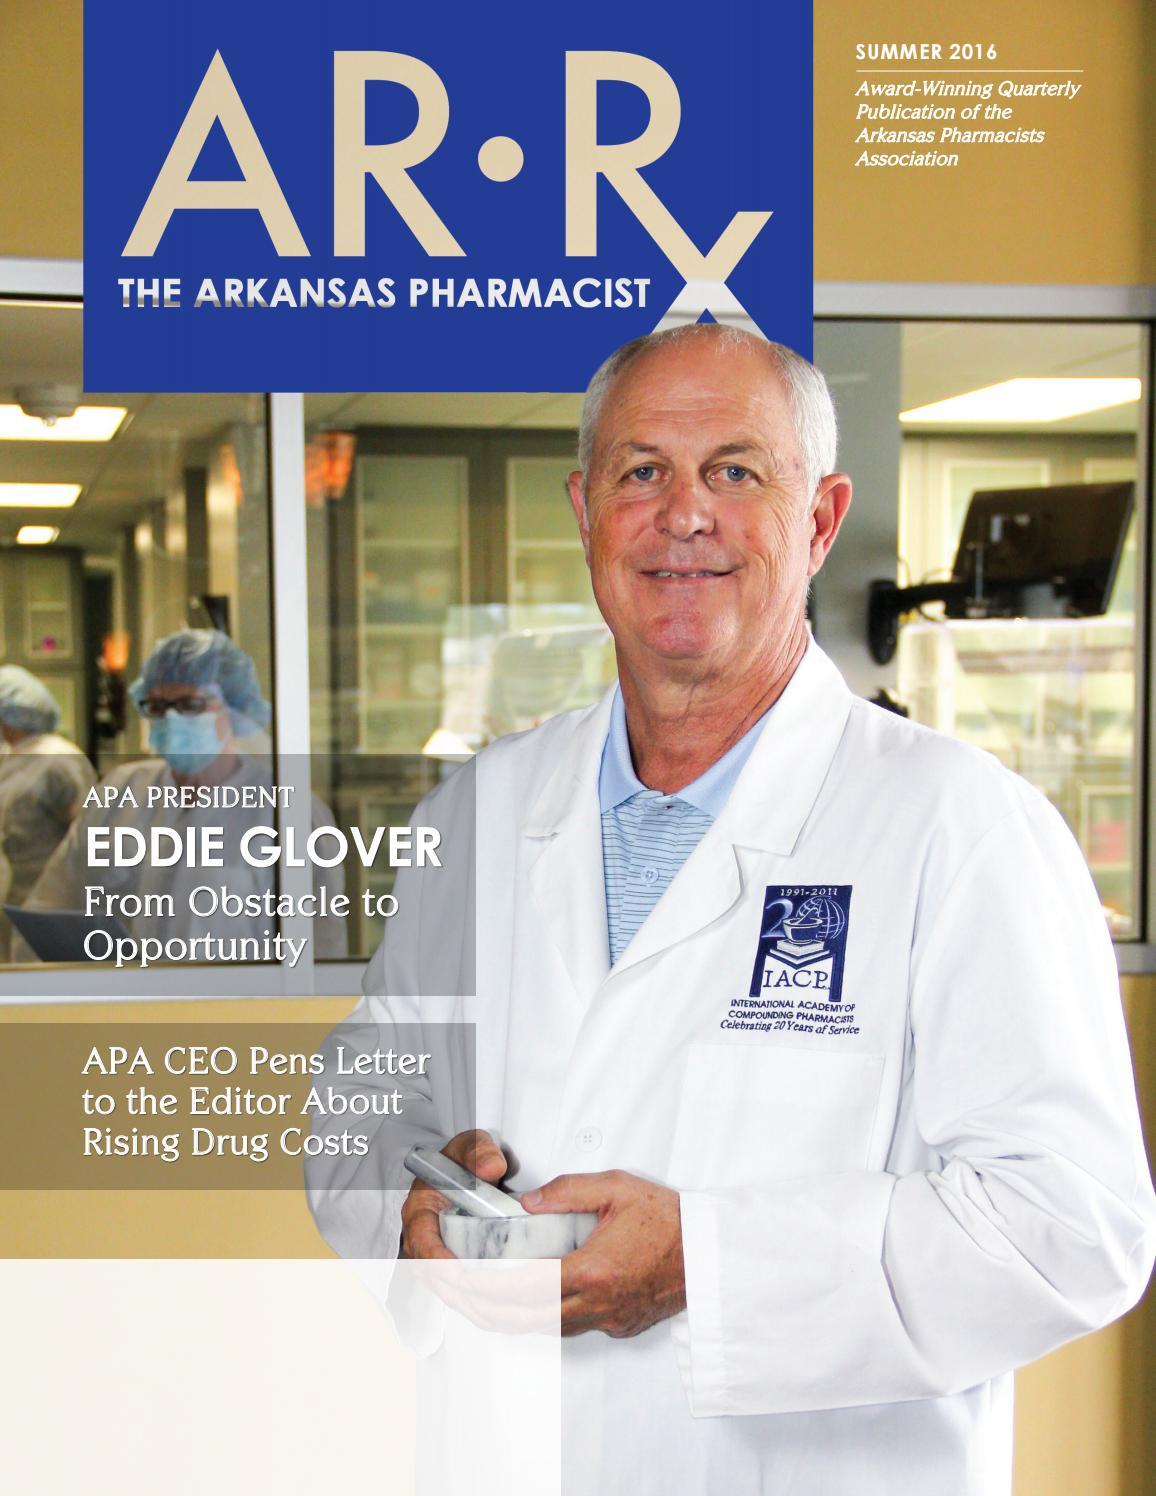 arrx the arkansas pharmacist summer by scott pace issuu